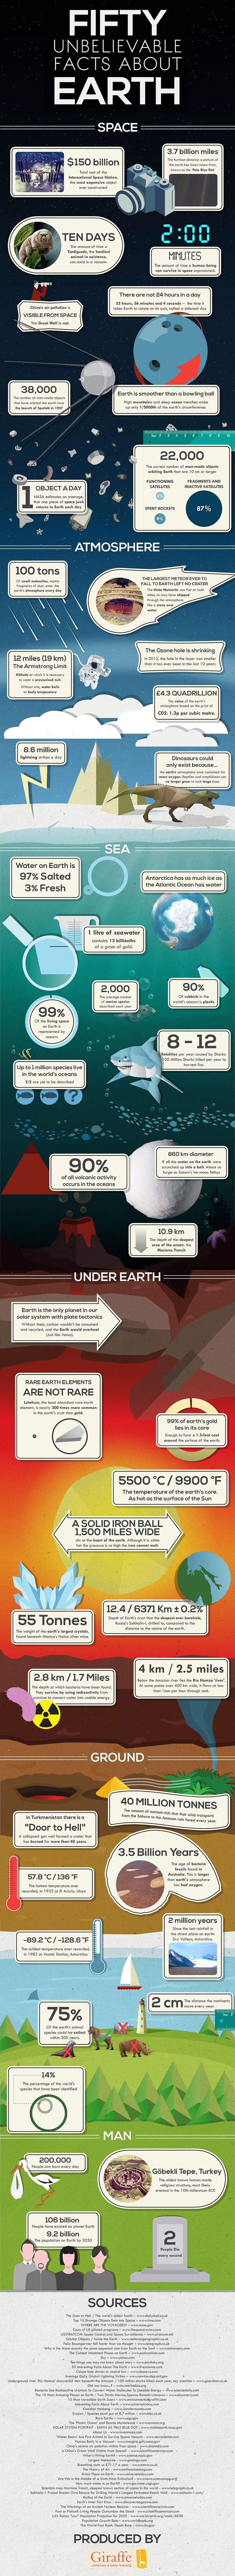 Michael Cerdeiros - Cerious Productions | 50 Unbelievable Facts About Earth - Michael Cerdeiros - Cerious Productions